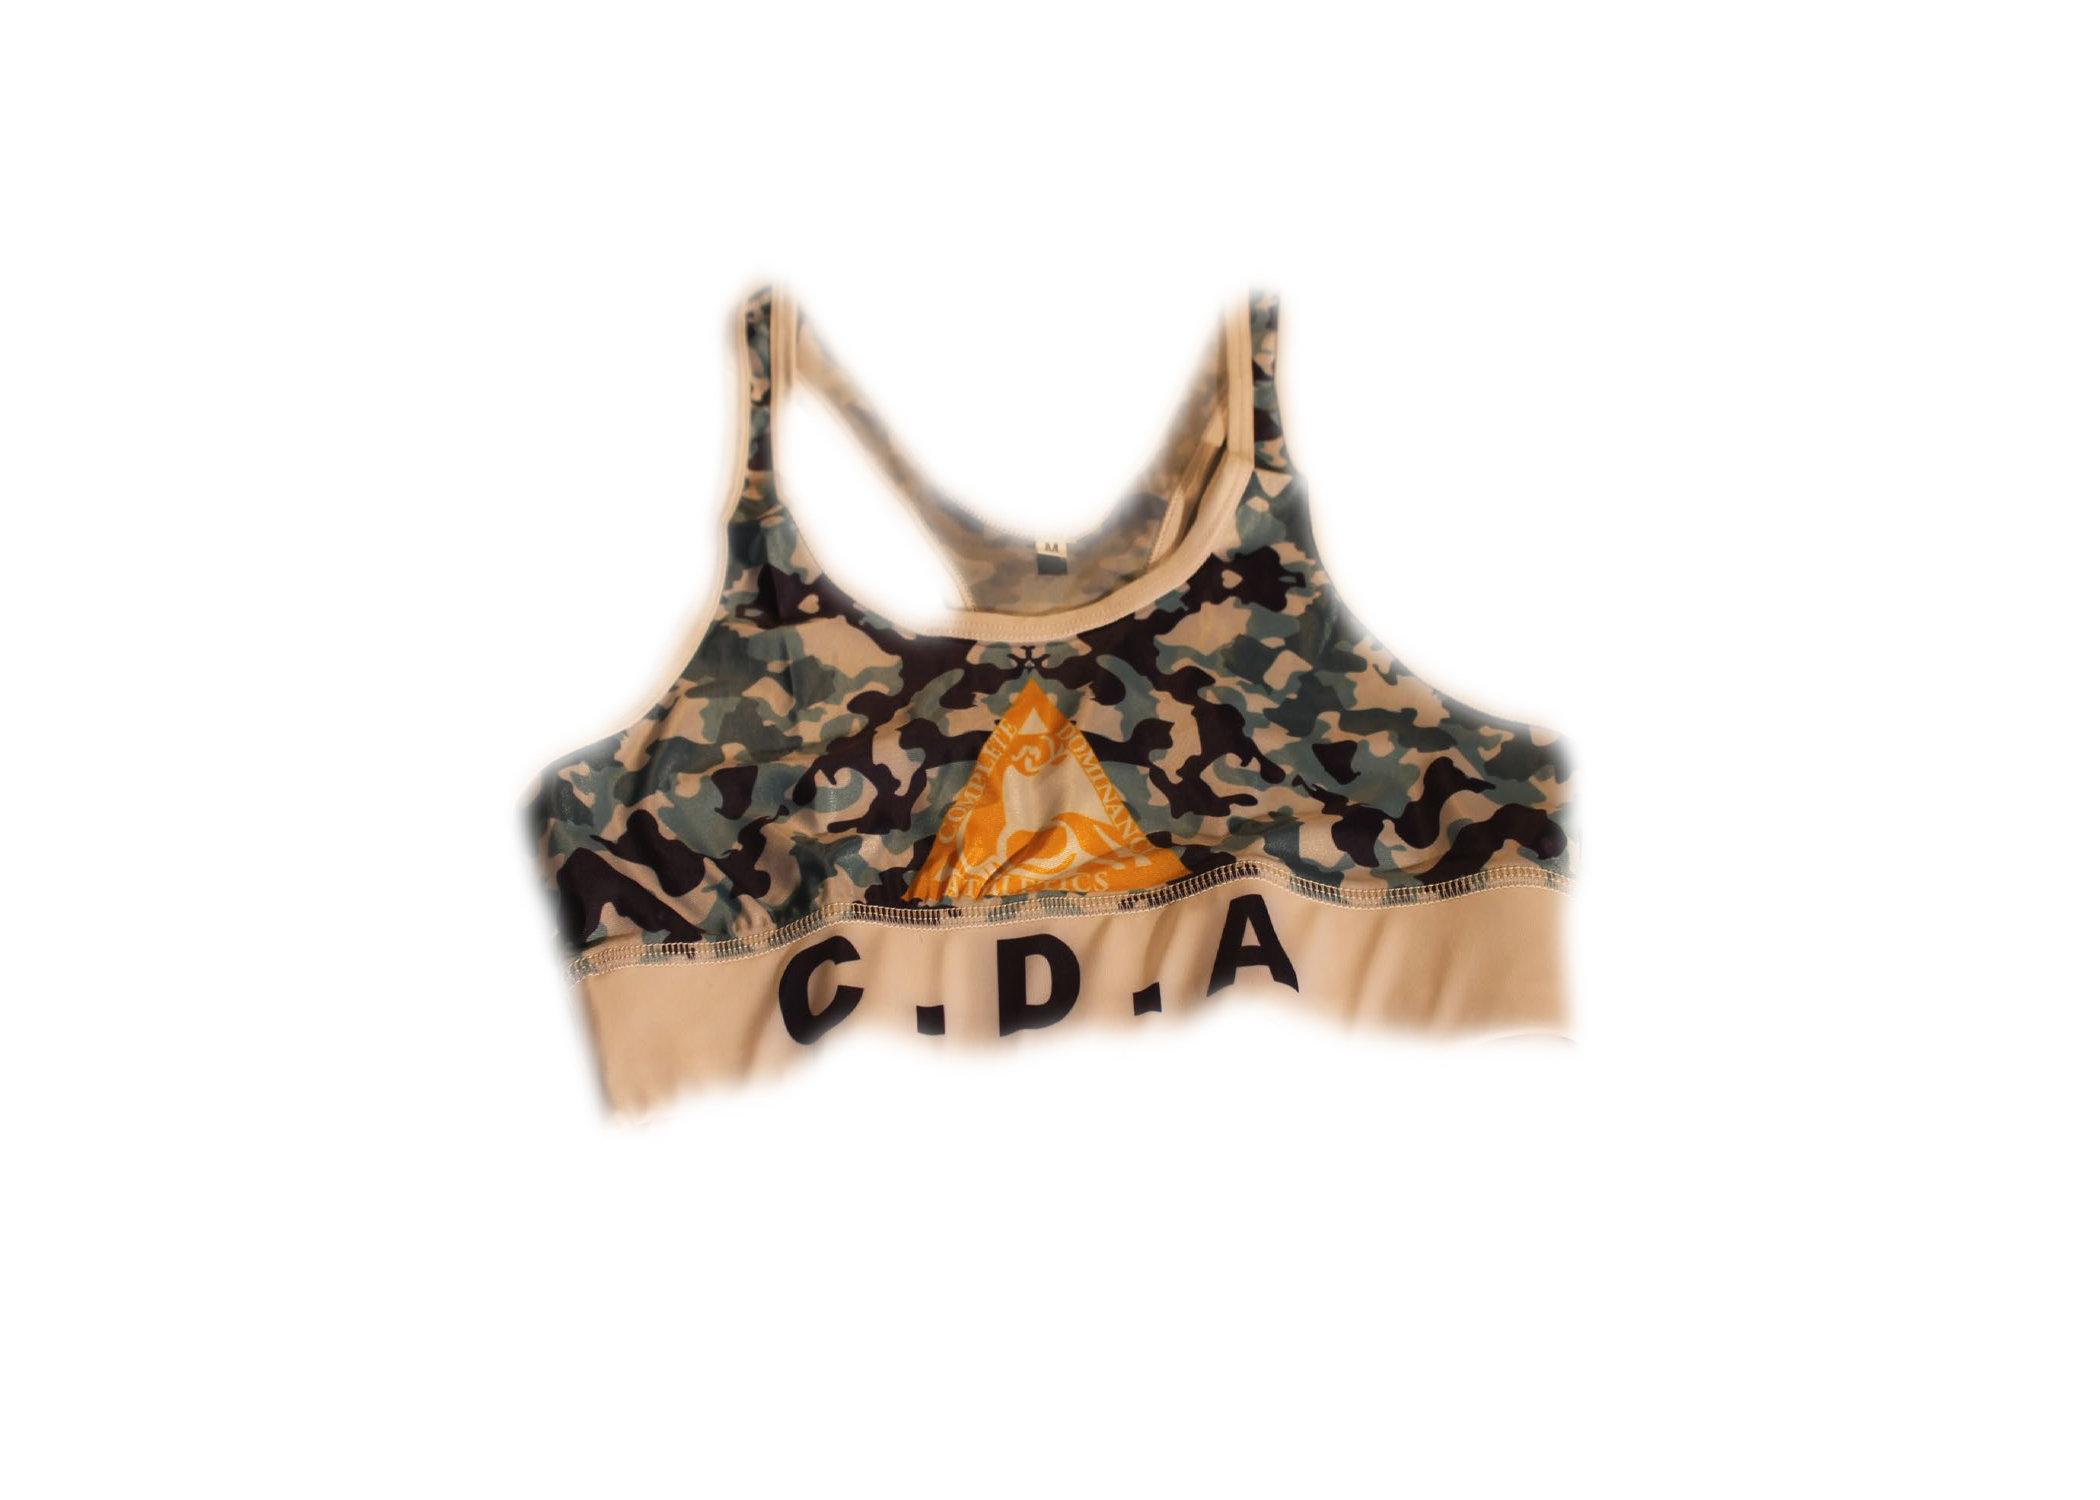 CDA camo sports bra 00239